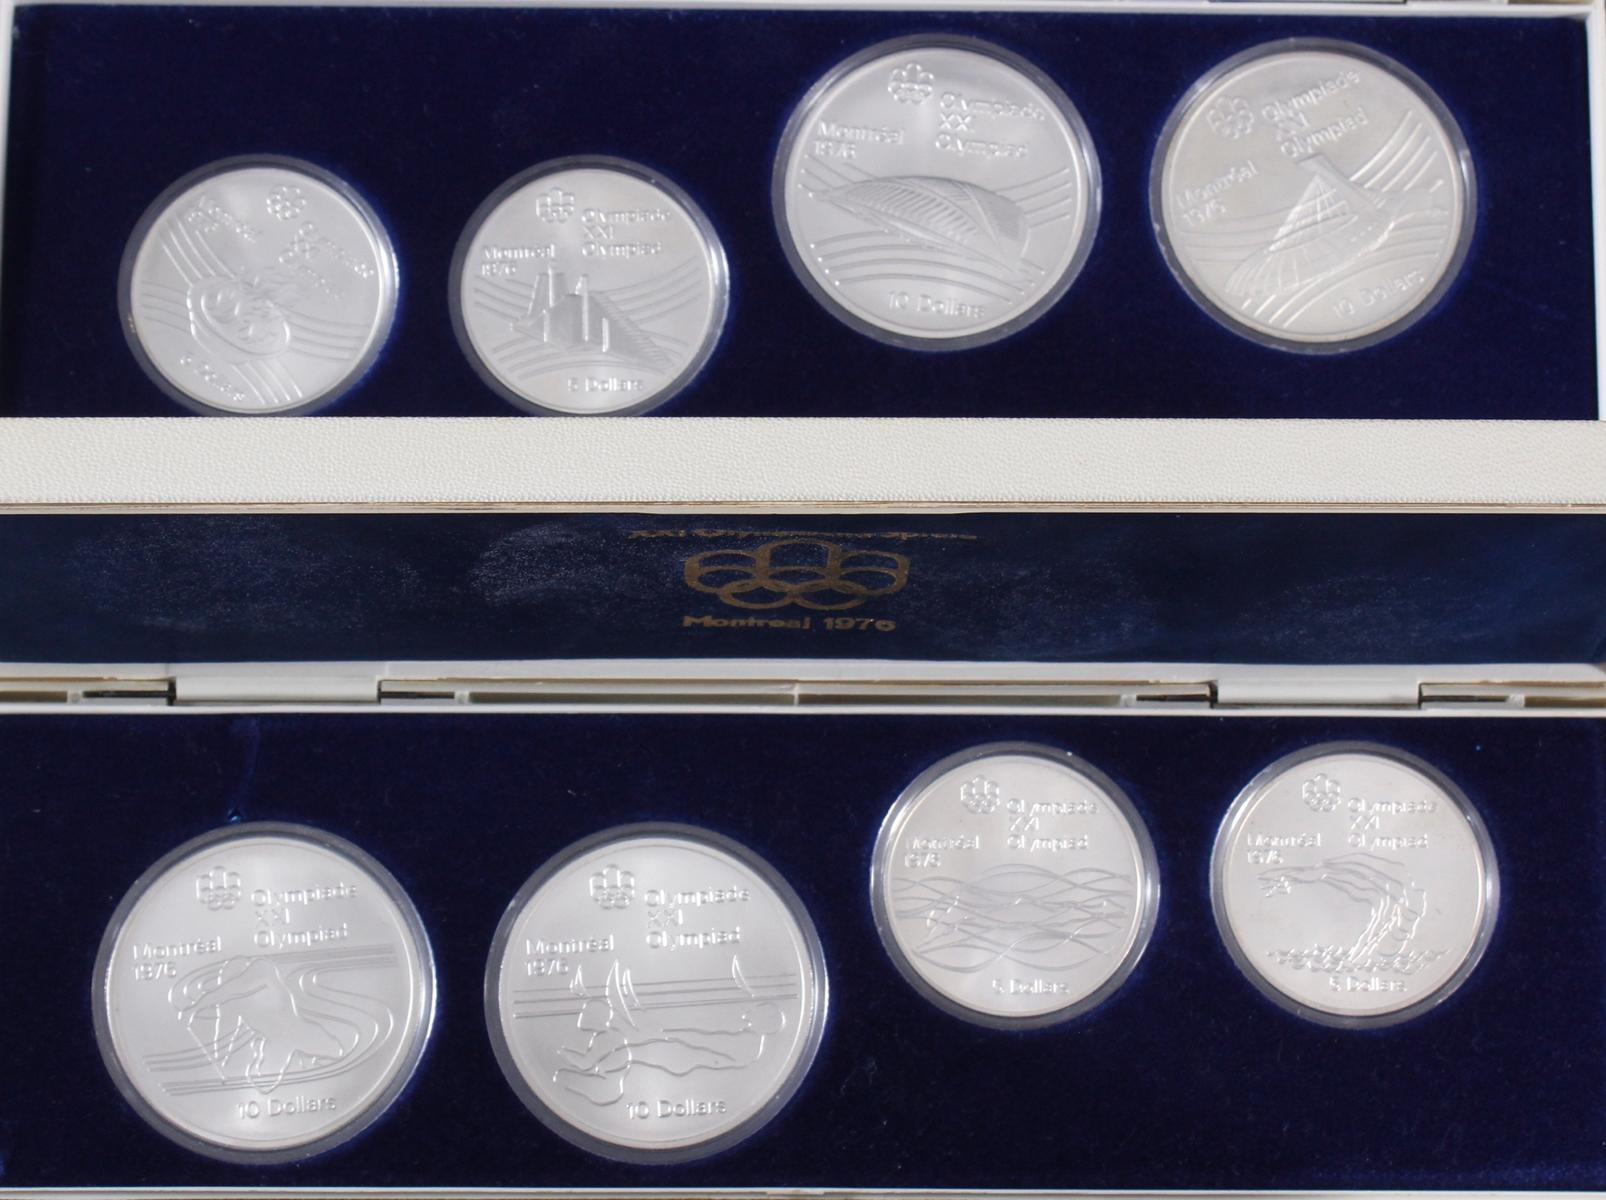 28x Silbermünzen Montreal 1976, kompletter Satz-3